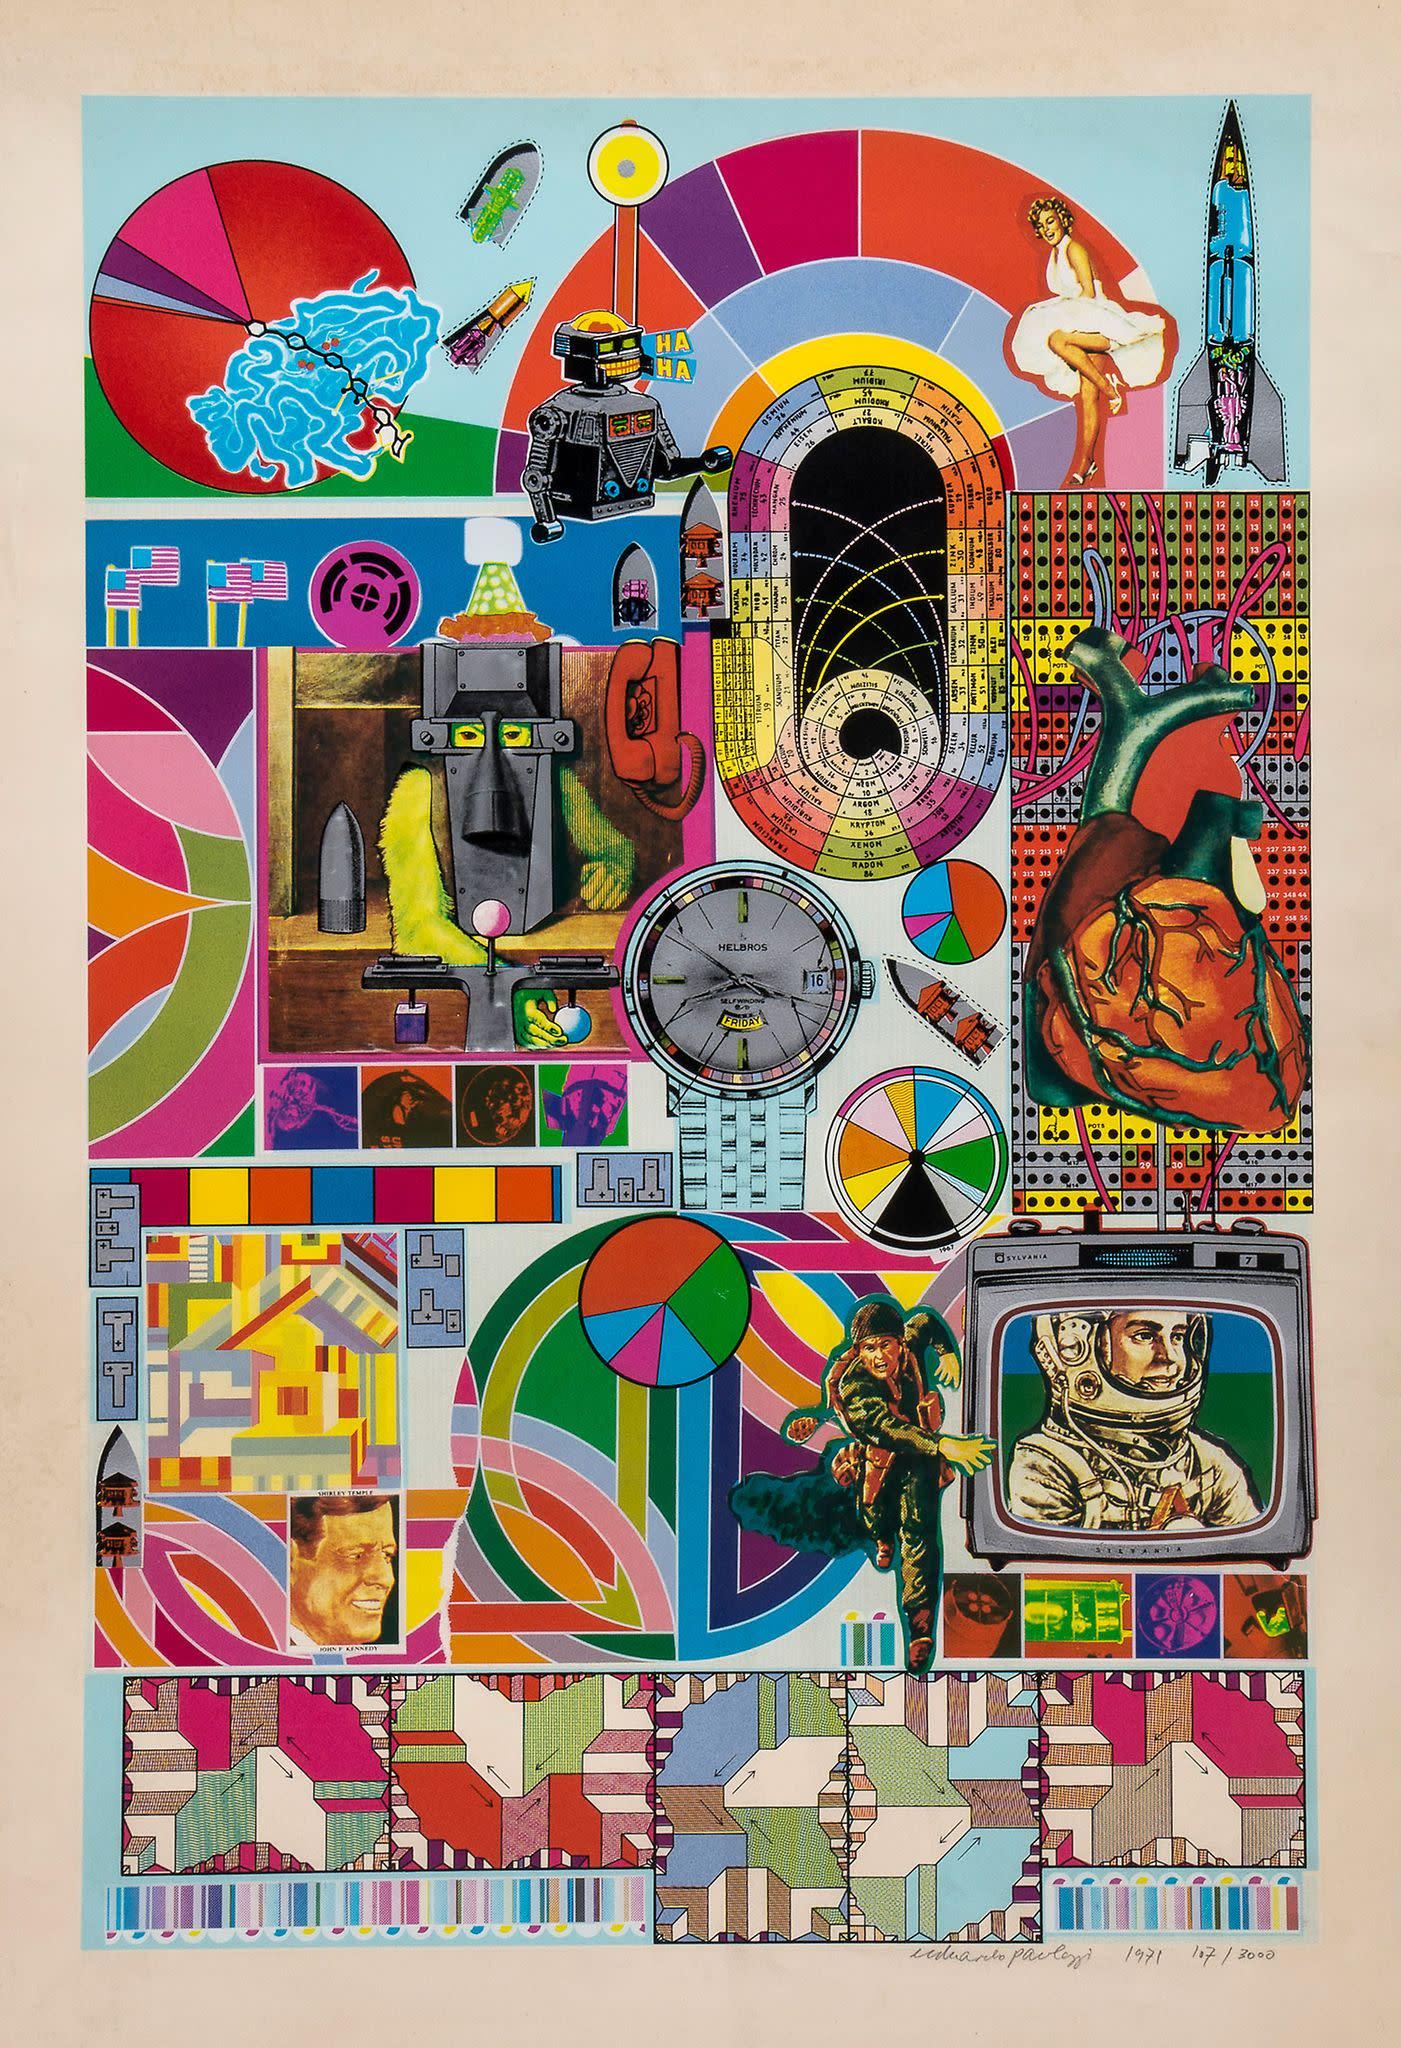 <span class=&#34;link fancybox-details-link&#34;><a href=&#34;/content/viewing-room/29/artworks407/&#34;>View Detail Page</a></span><div class=&#34;artist&#34;><strong>Eduardo Paolozzi</strong></div><div class=&#34;title&#34;><em>B.A.S.H (Blue)</em>, 1971</div><div class=&#34;signed_and_dated&#34;>Stamped Paolozzi Foundation</div><div class=&#34;medium&#34;>Screenprint - AP </div><div class=&#34;dimensions&#34;>84.5 x 59cm</div>£ 1,600.00